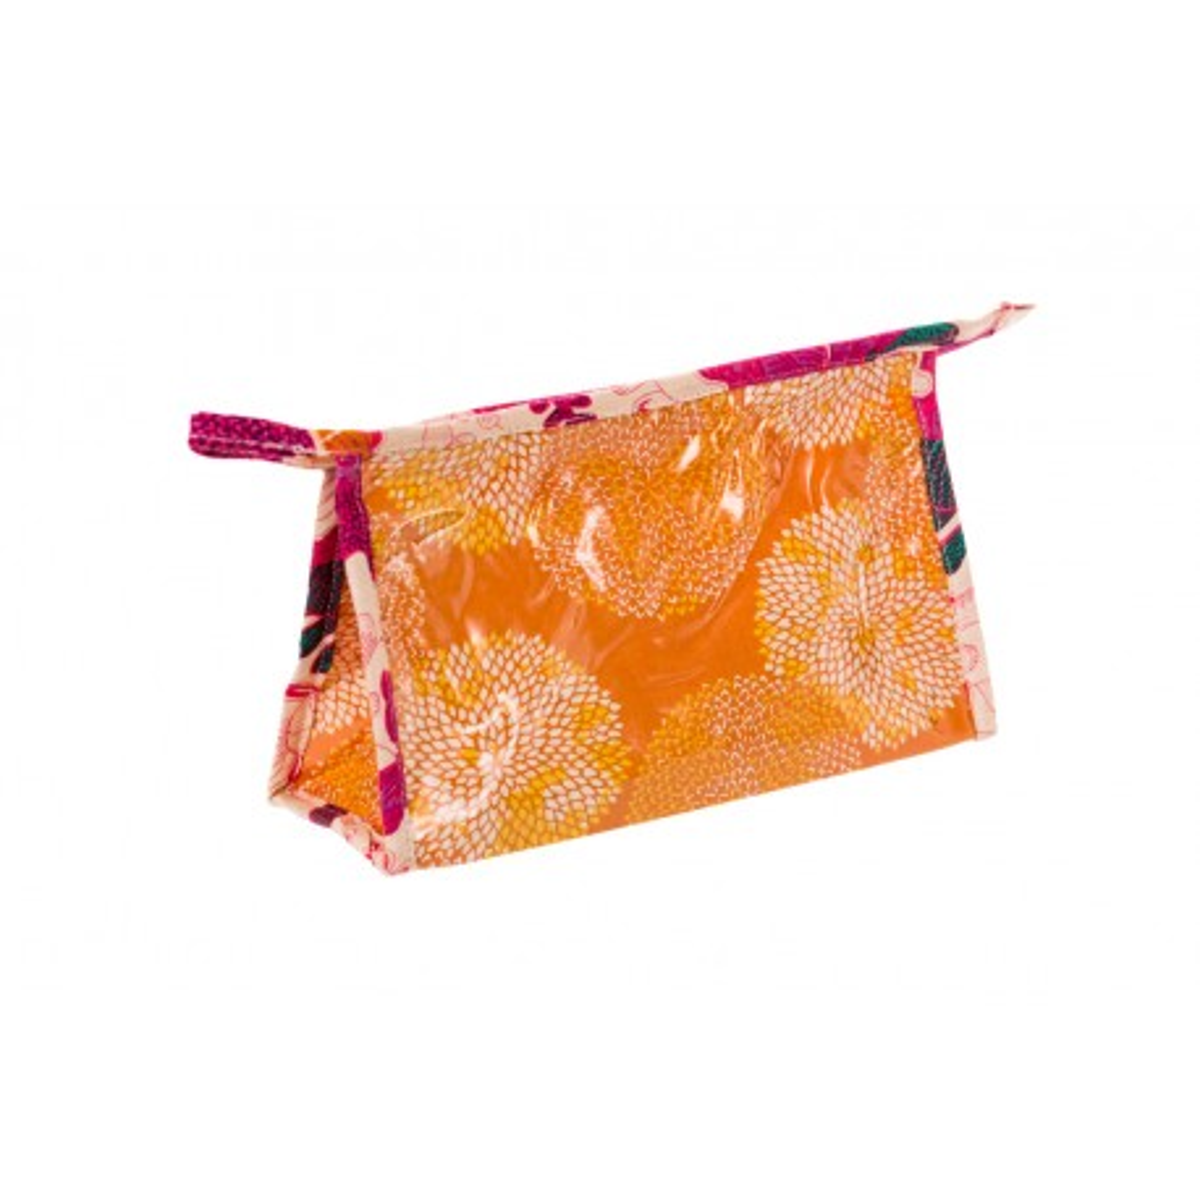 Petite trousse de toilette original tissu orange Papillons